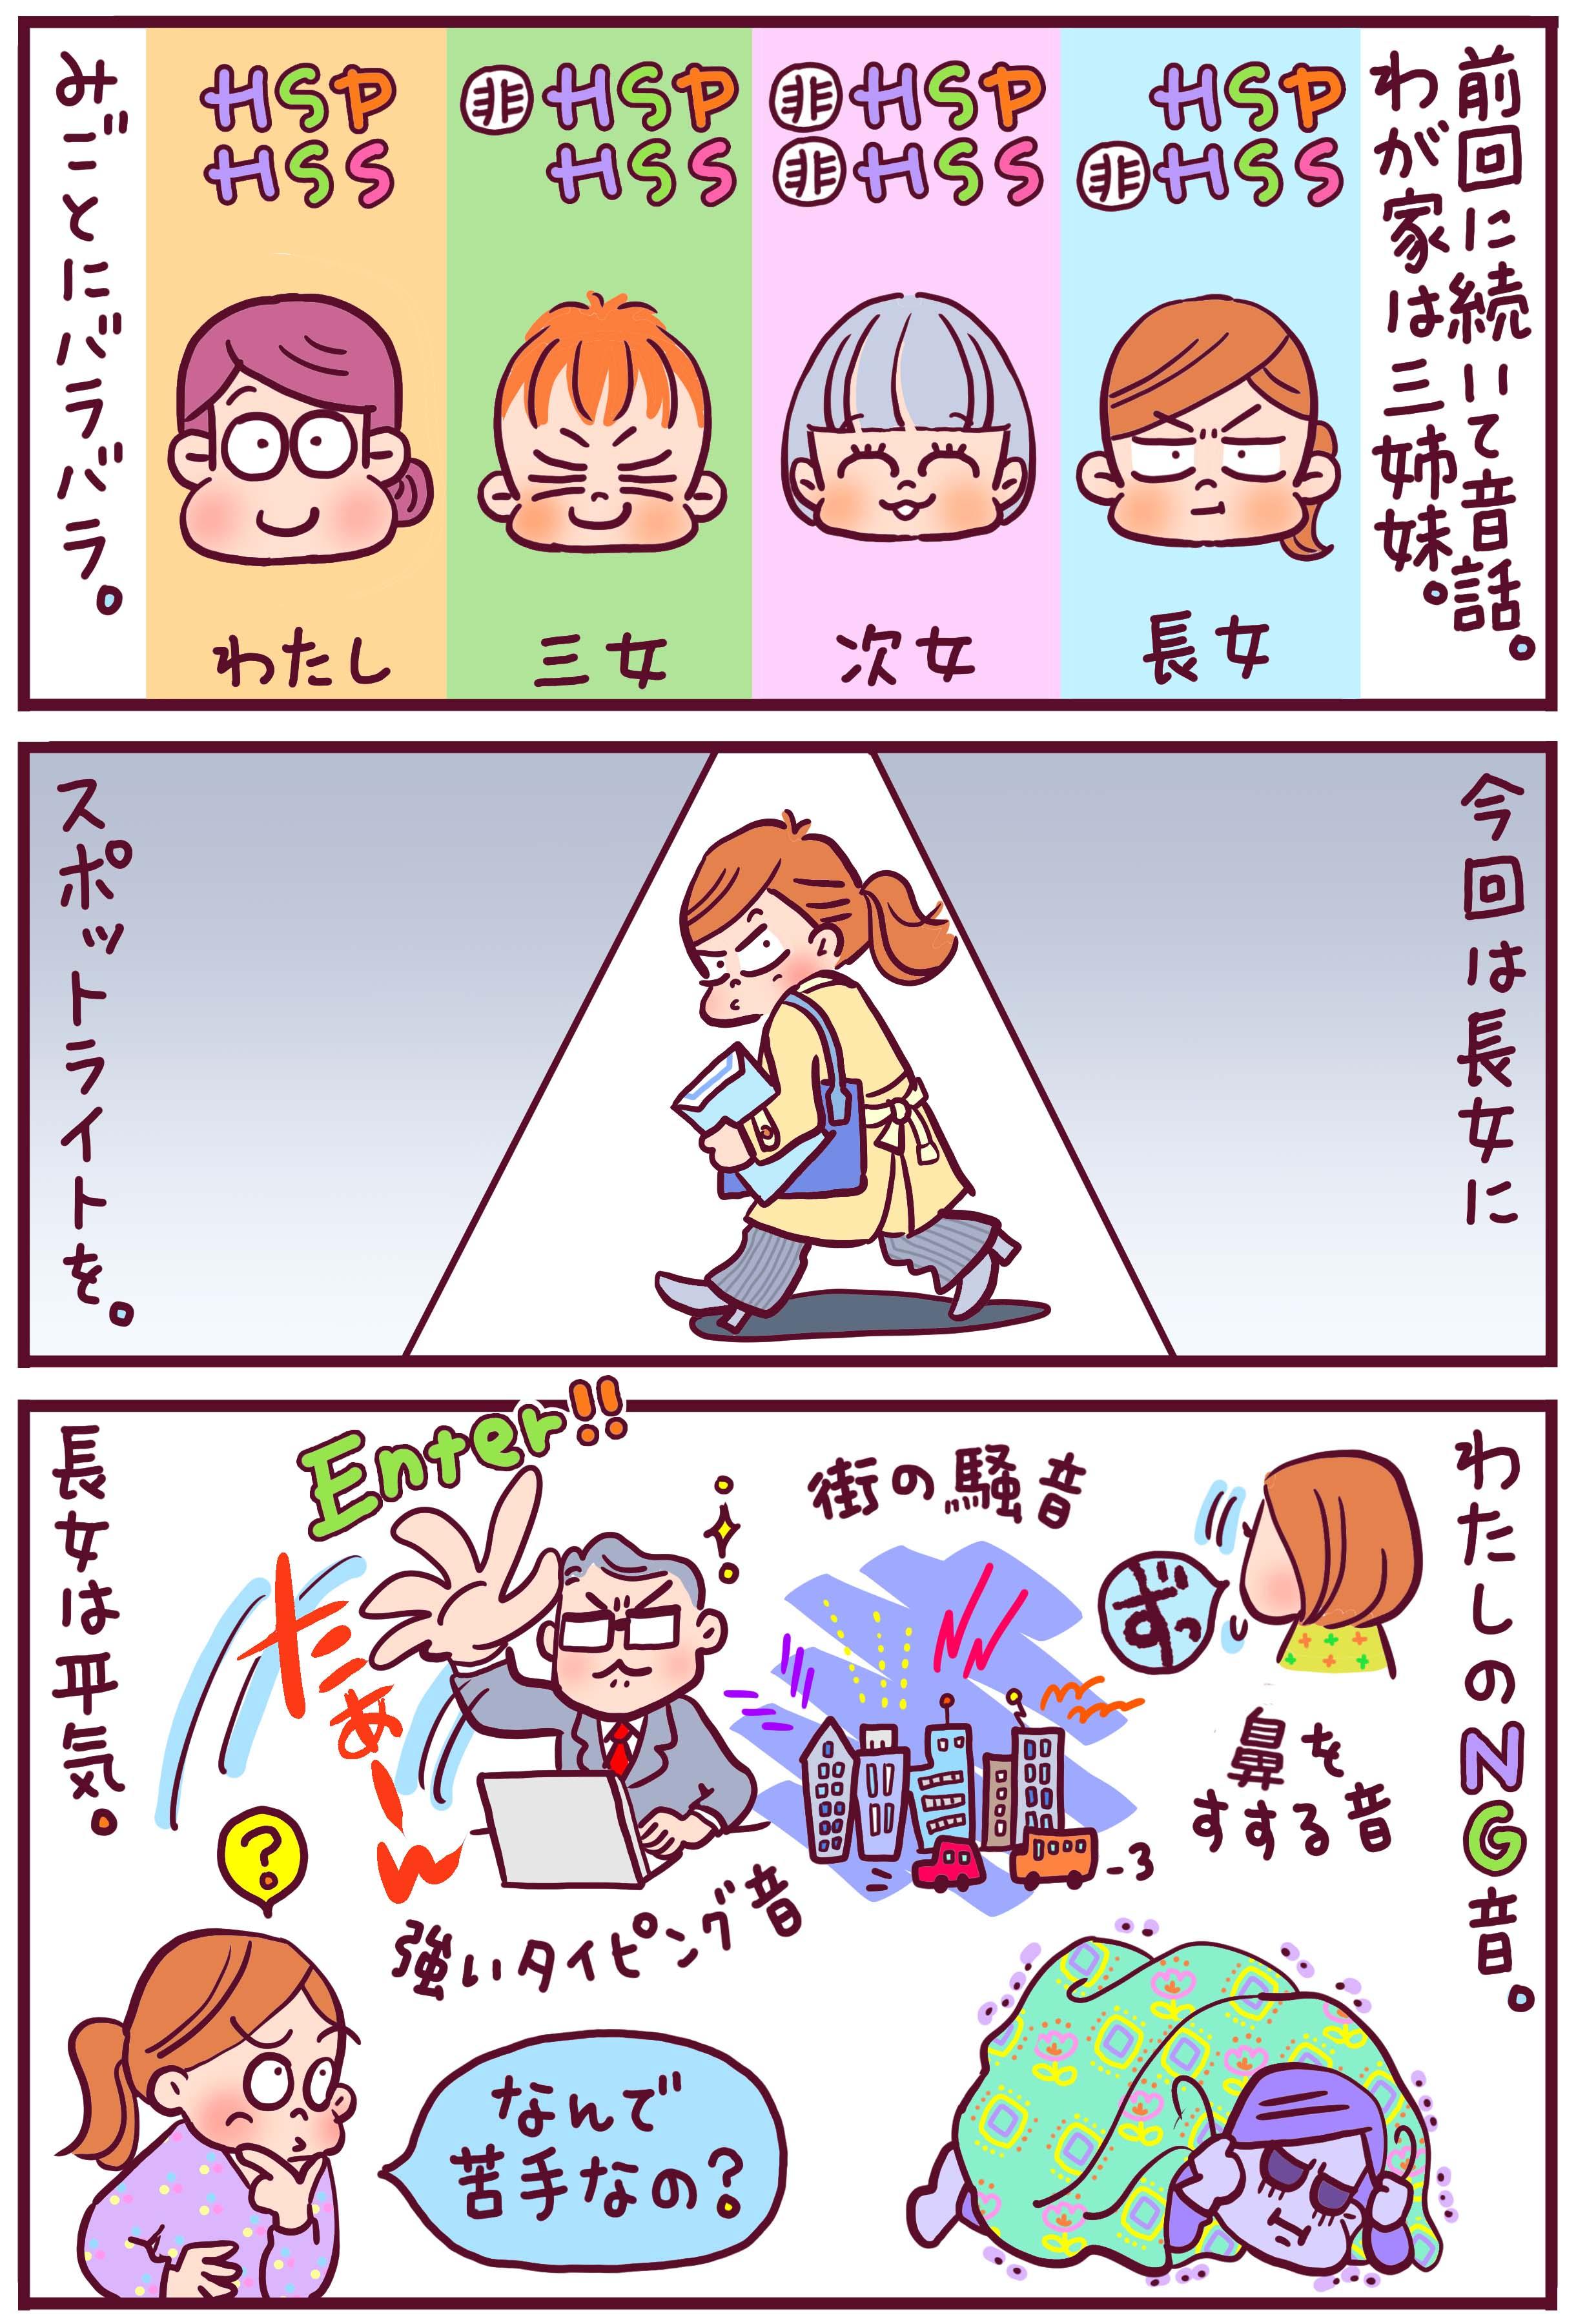 HSPマンガエッセイ(高野優)